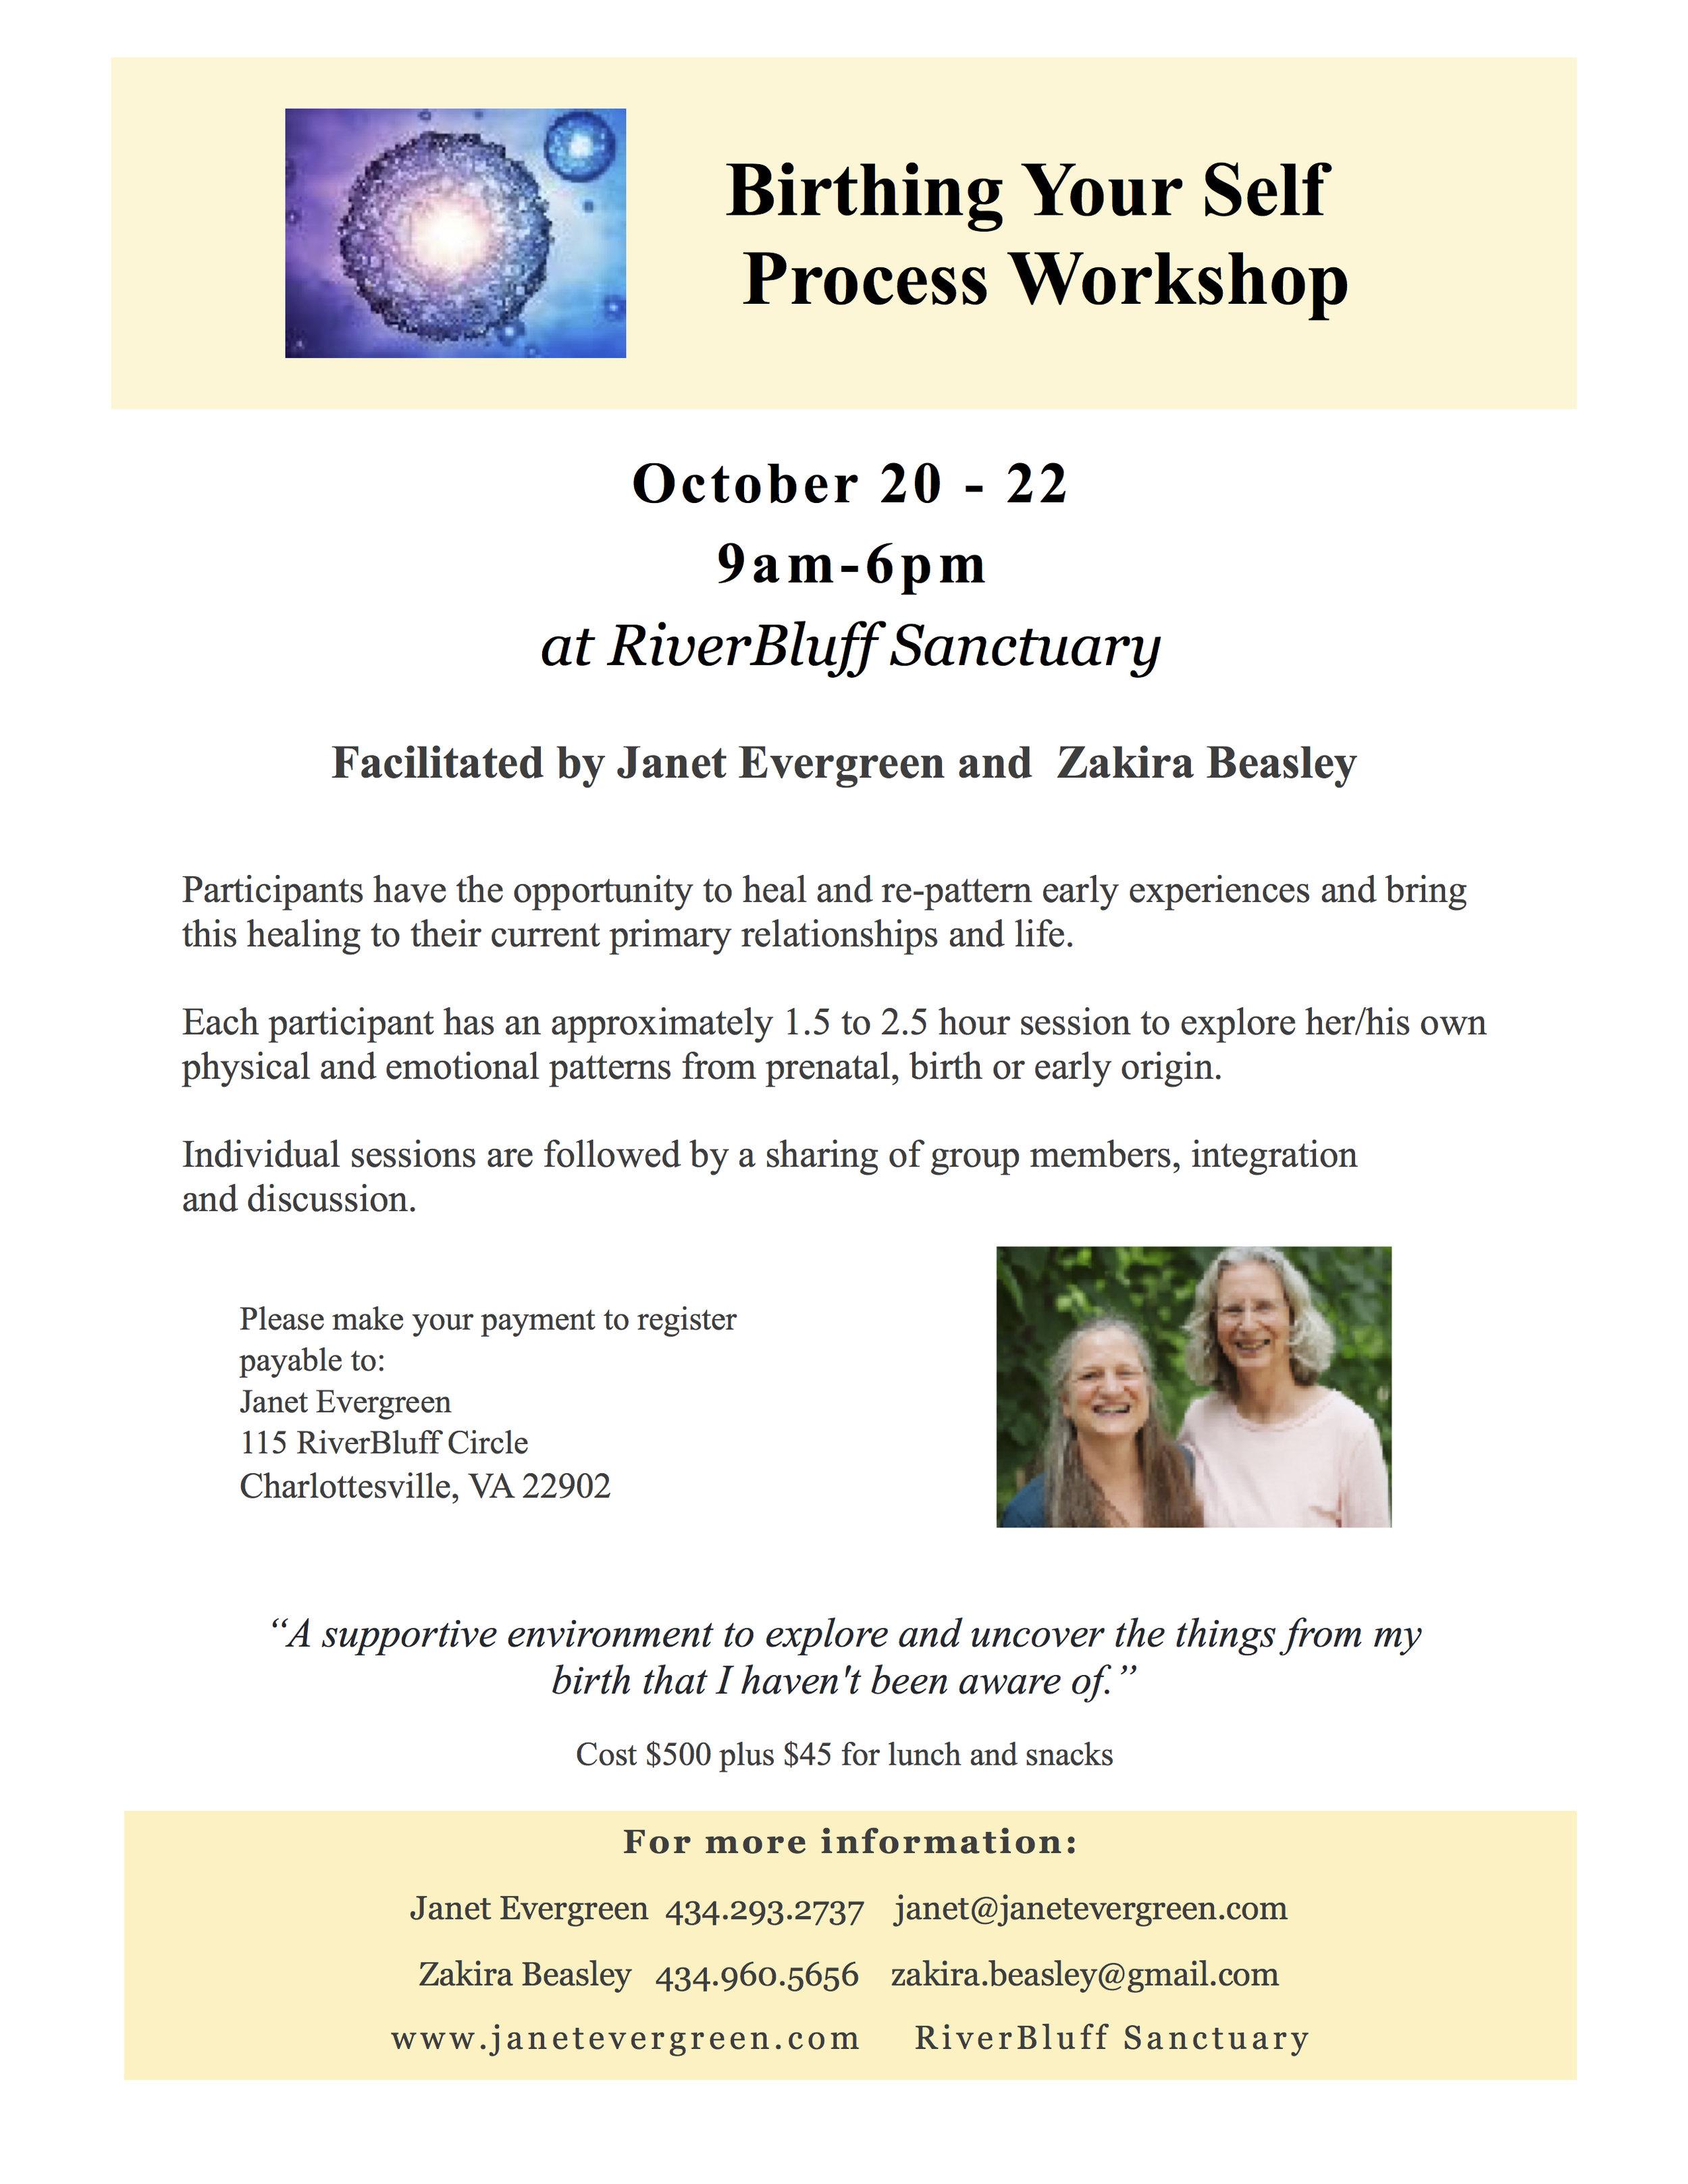 Birthing_yourself_process_workshop_janet_evergreen_zakira_beasley_charlottesville_virginia